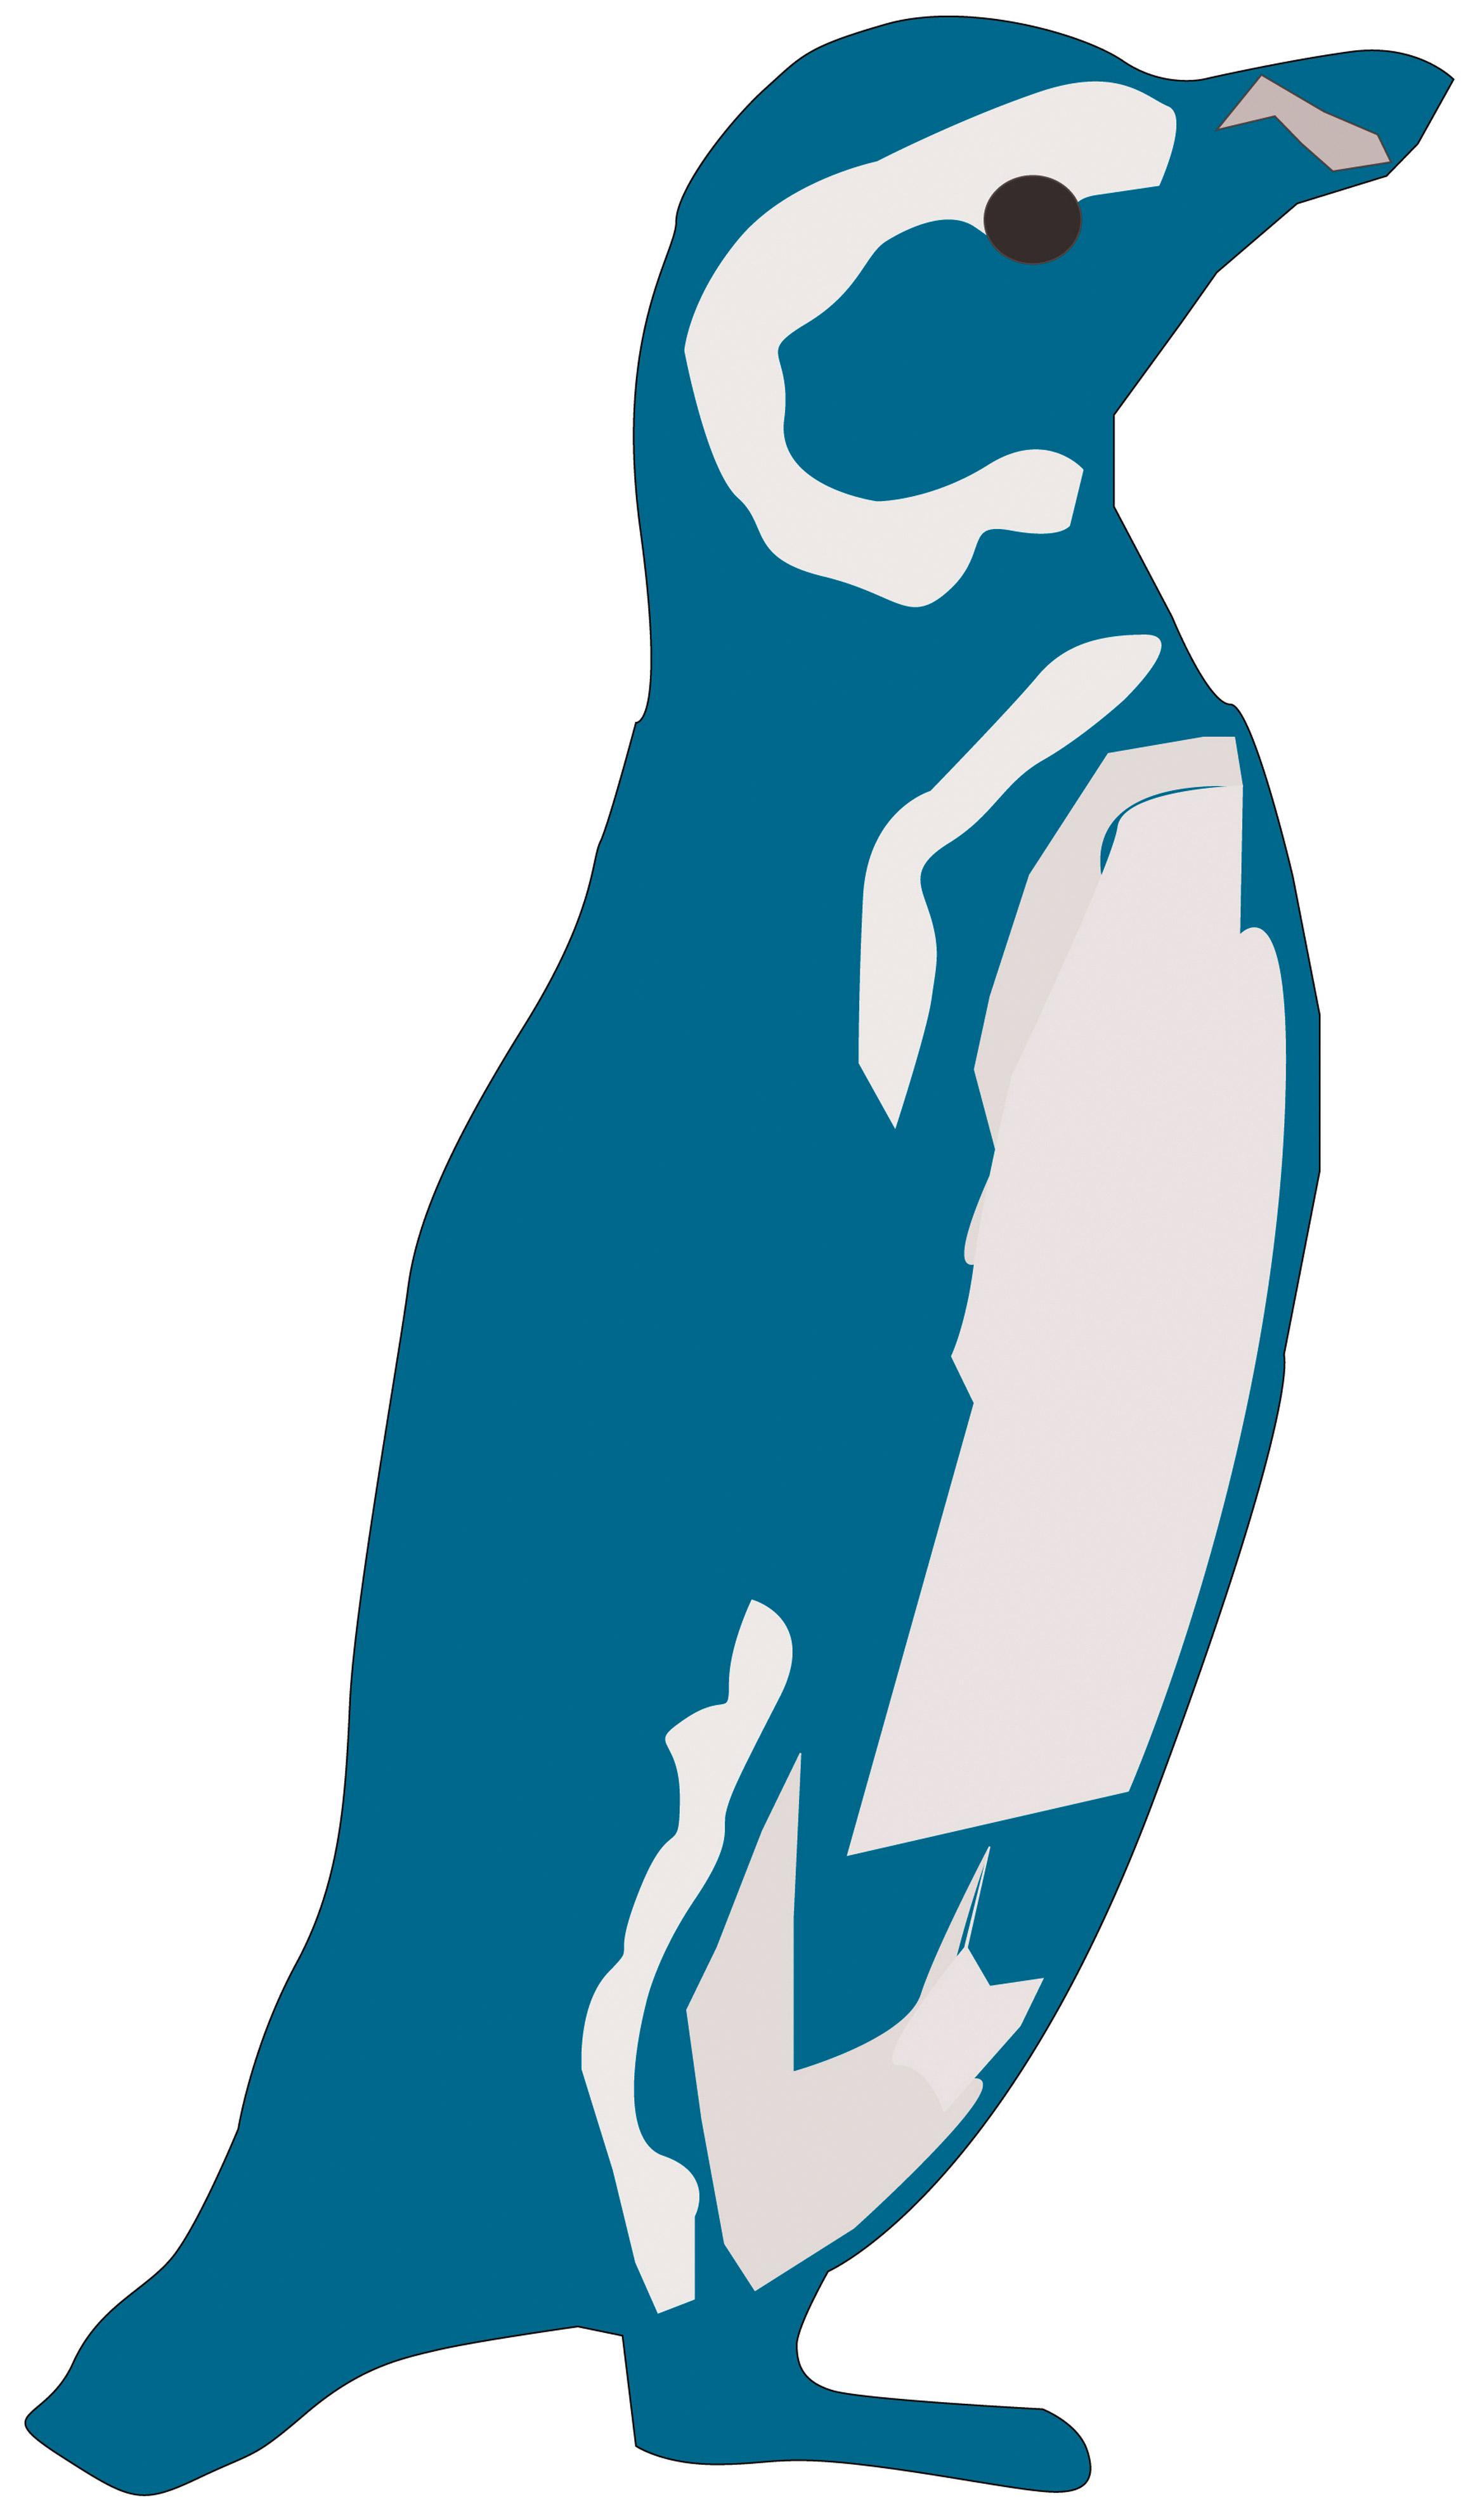 Pinguino reale spiaggiato in Nuova Zelanda |Happy Feet Zoo Aquarium